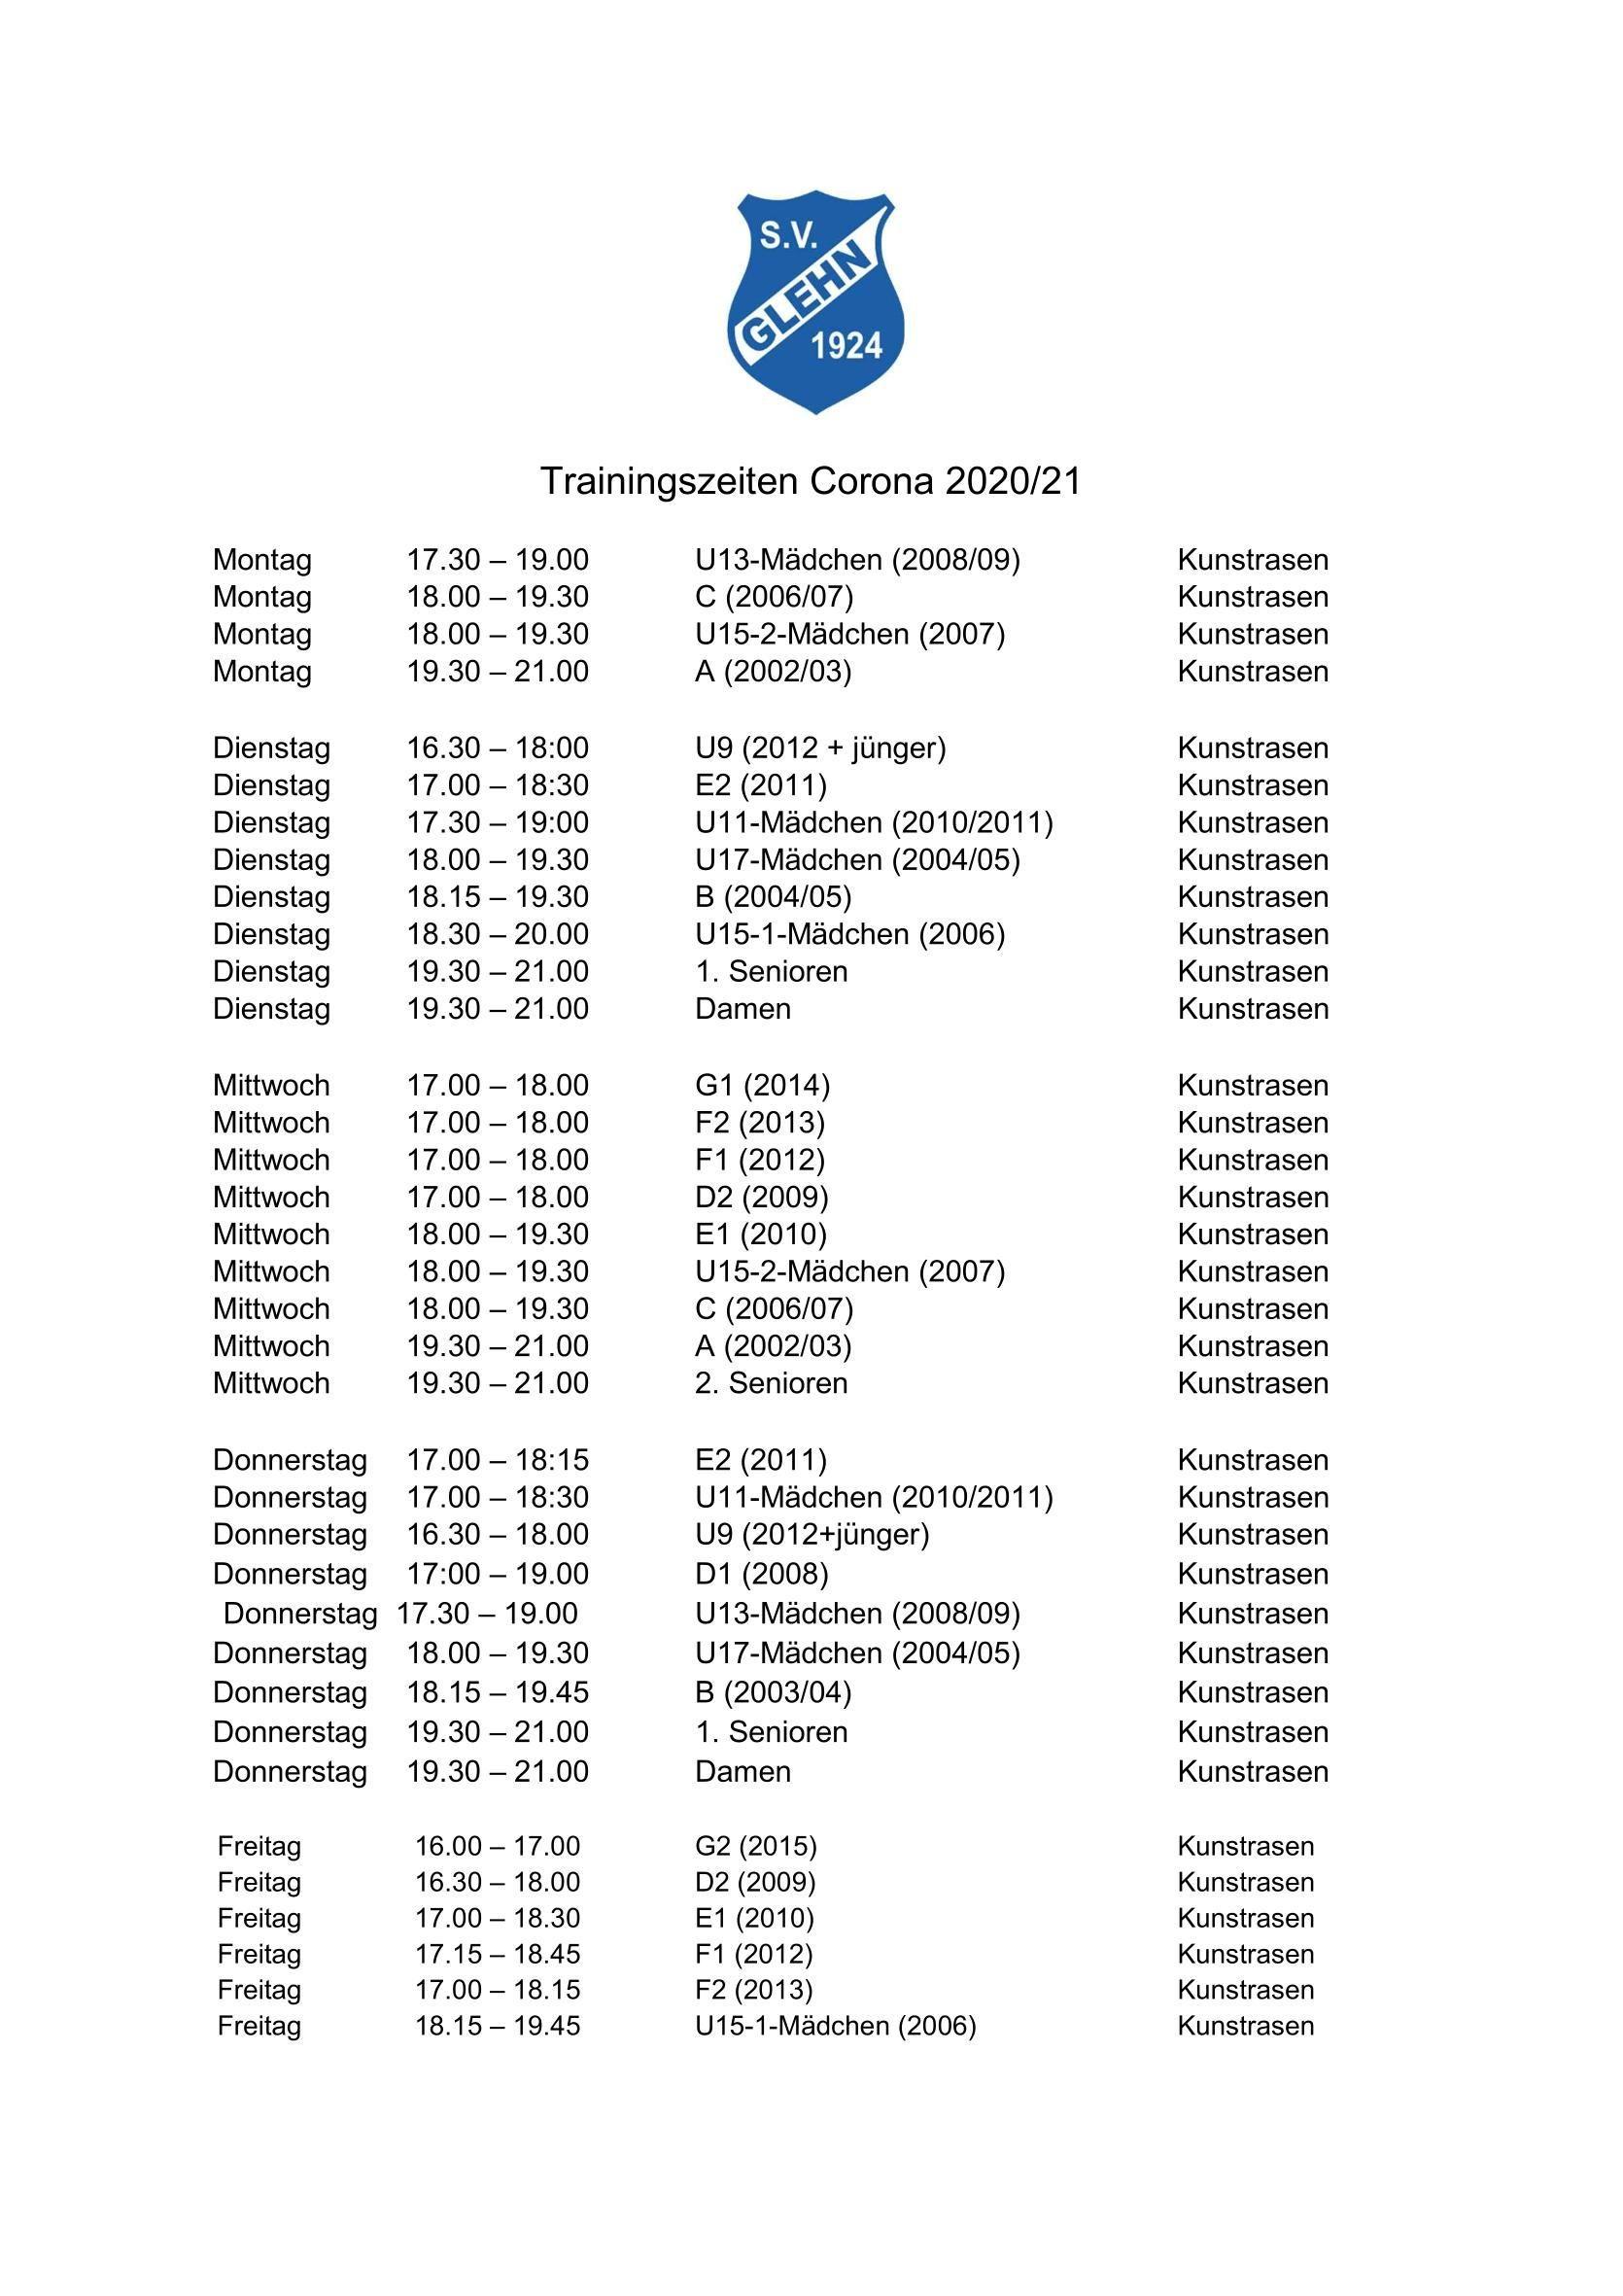 Trainingszeiten - gültig ab 25.Mai